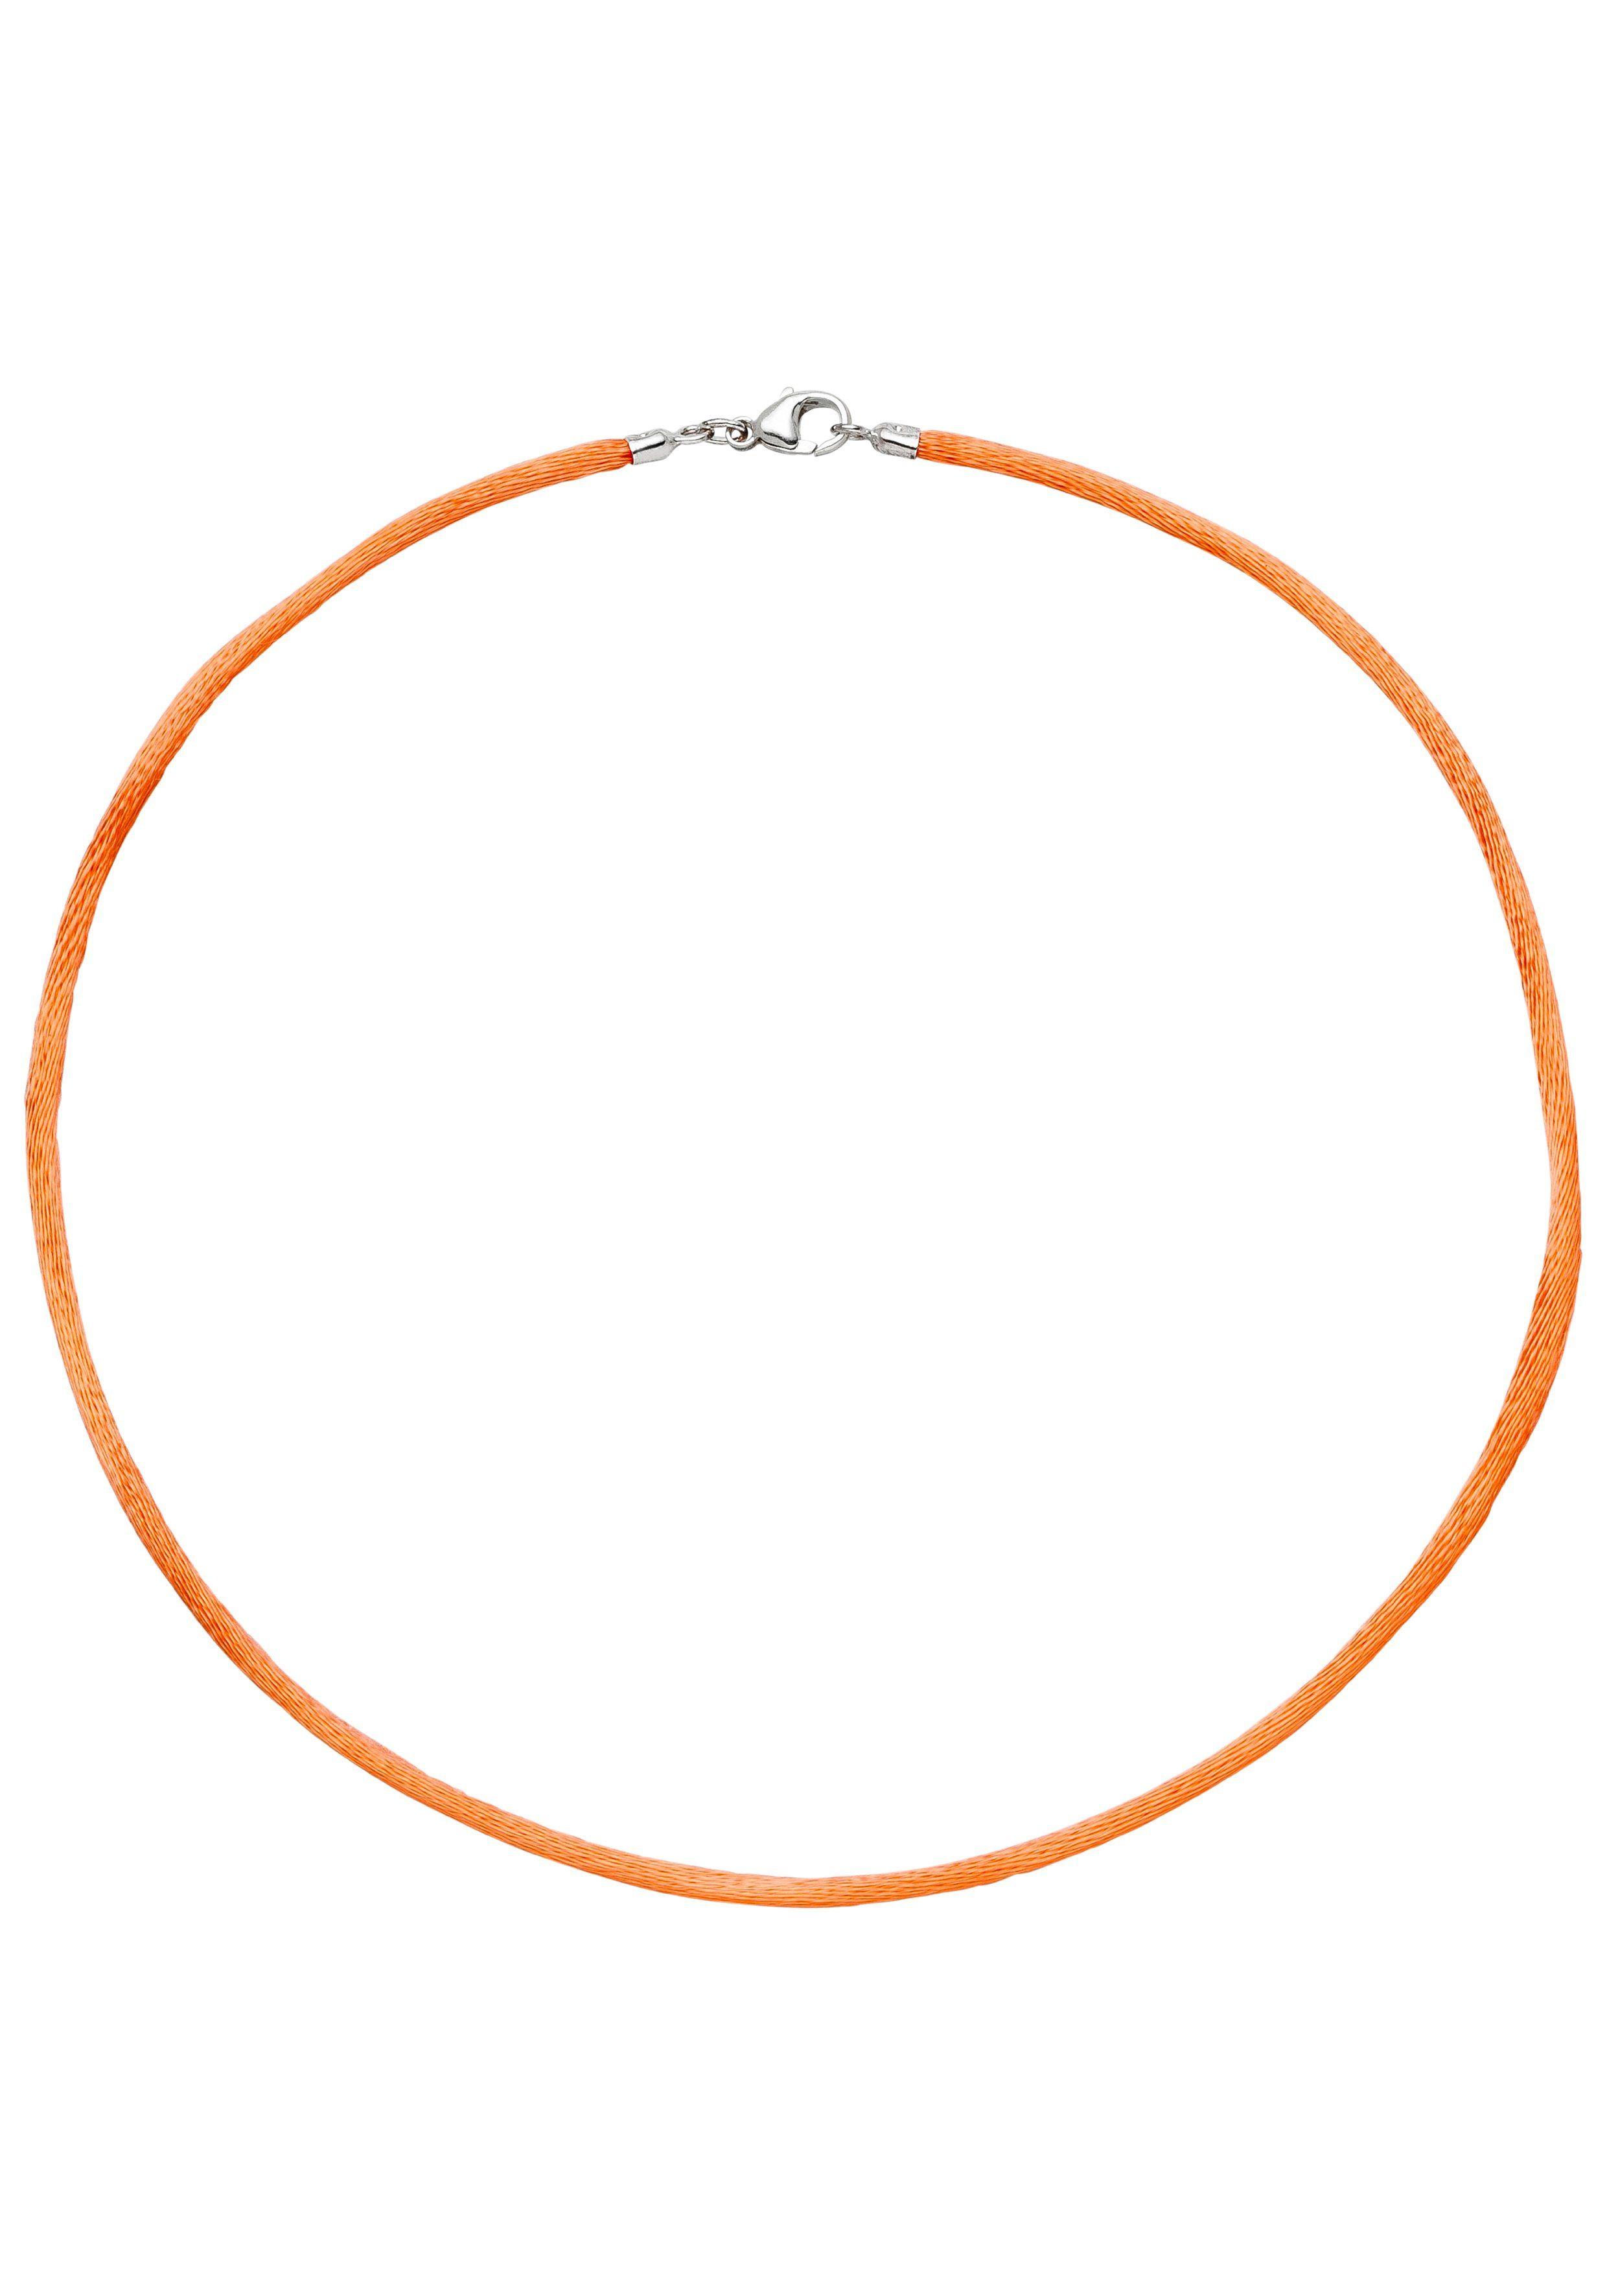 JOBO Kette ohne Anhänger »Seidenkette« Seidenkette orange 42 cm